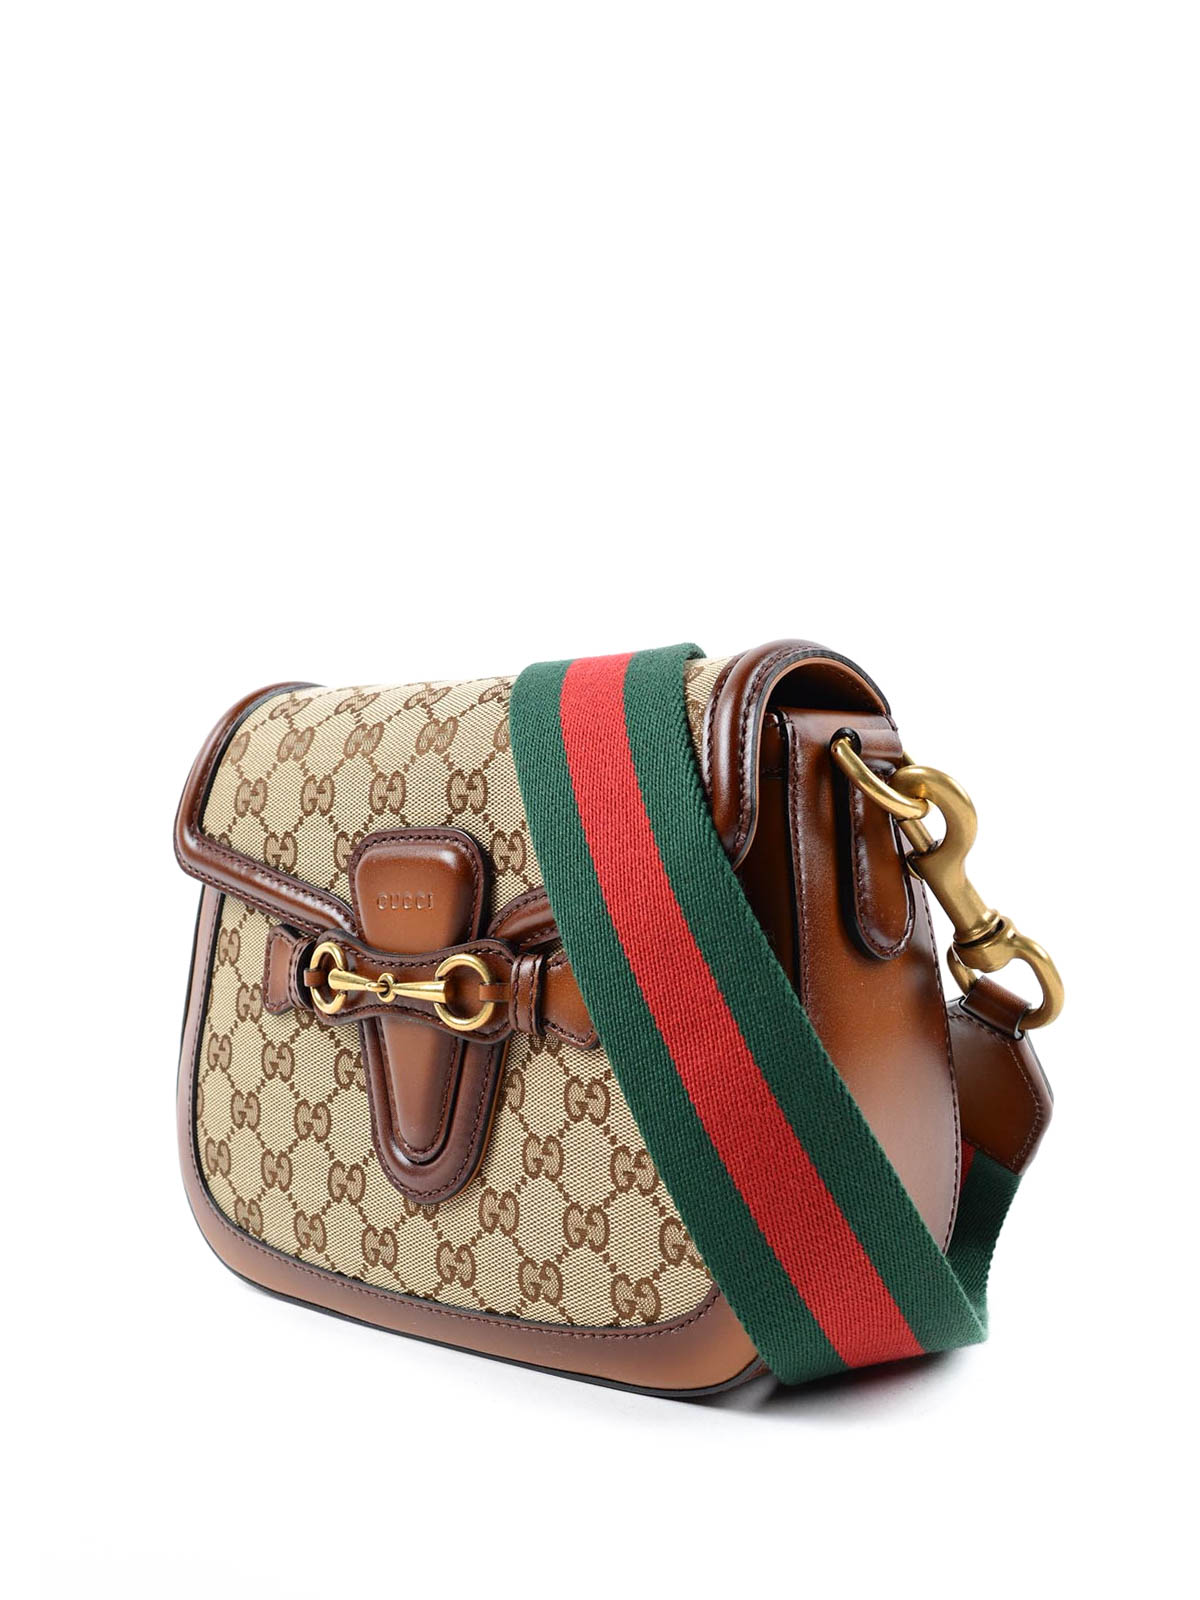 07be939cc857 Gucci - Lady Web Original GG canvas bag - shoulder bags - 383848 ...